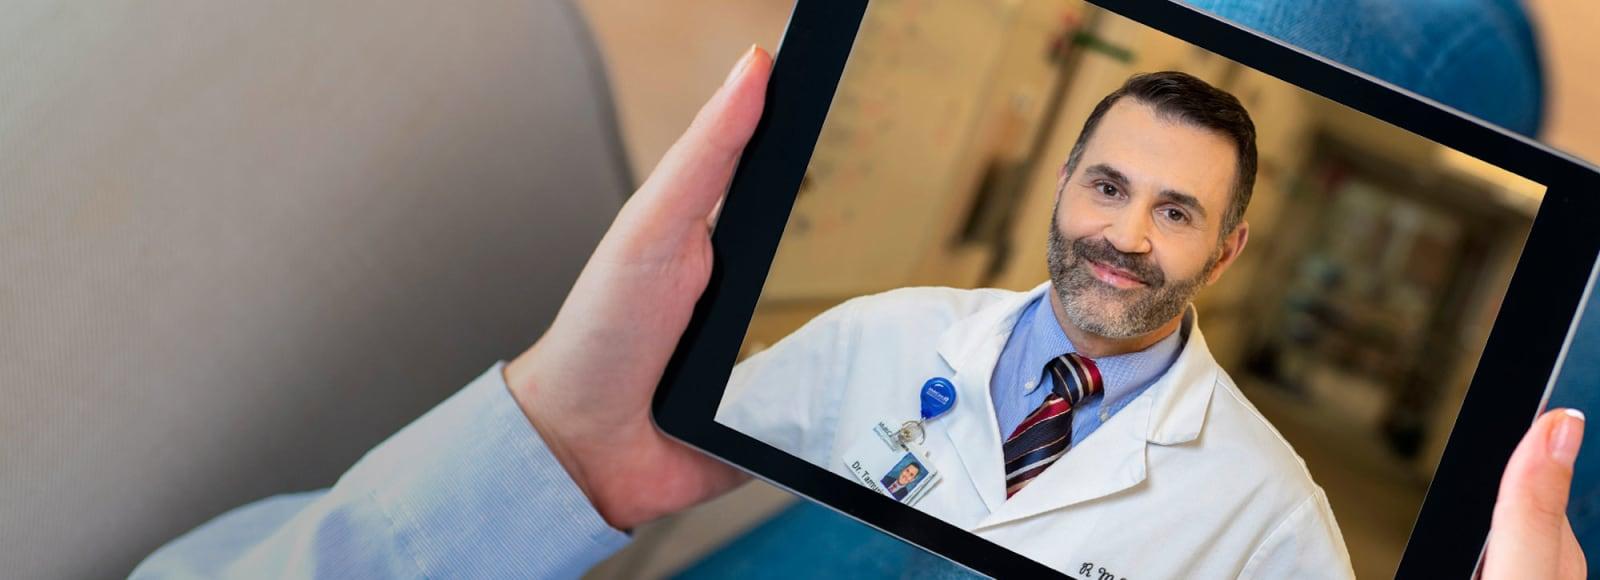 Virtual visit - provider on tablet